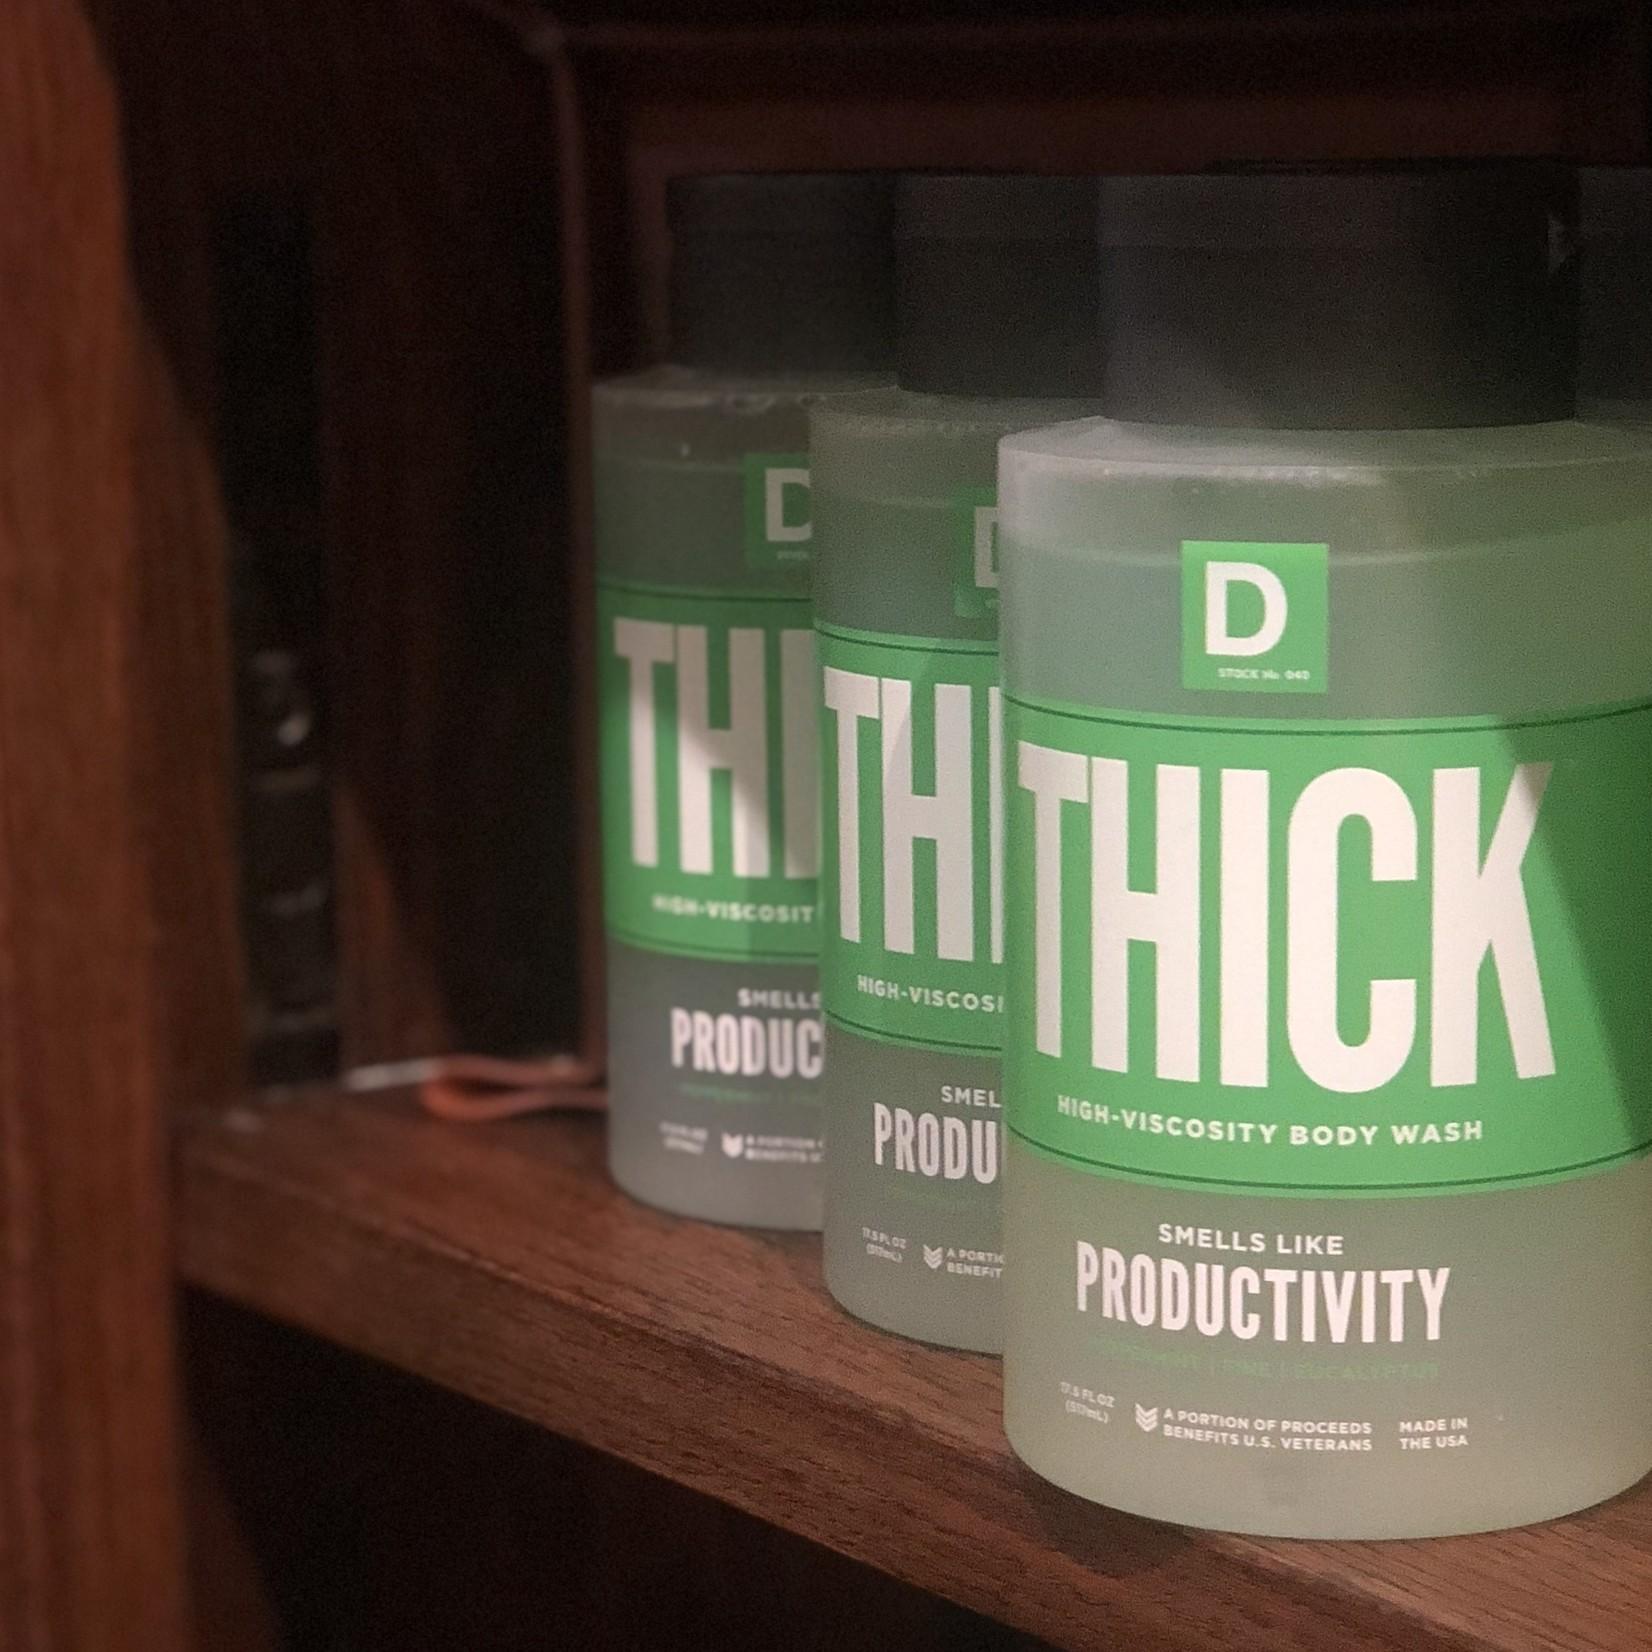 Duke Cannon THICK High-Viscosity Body Wash